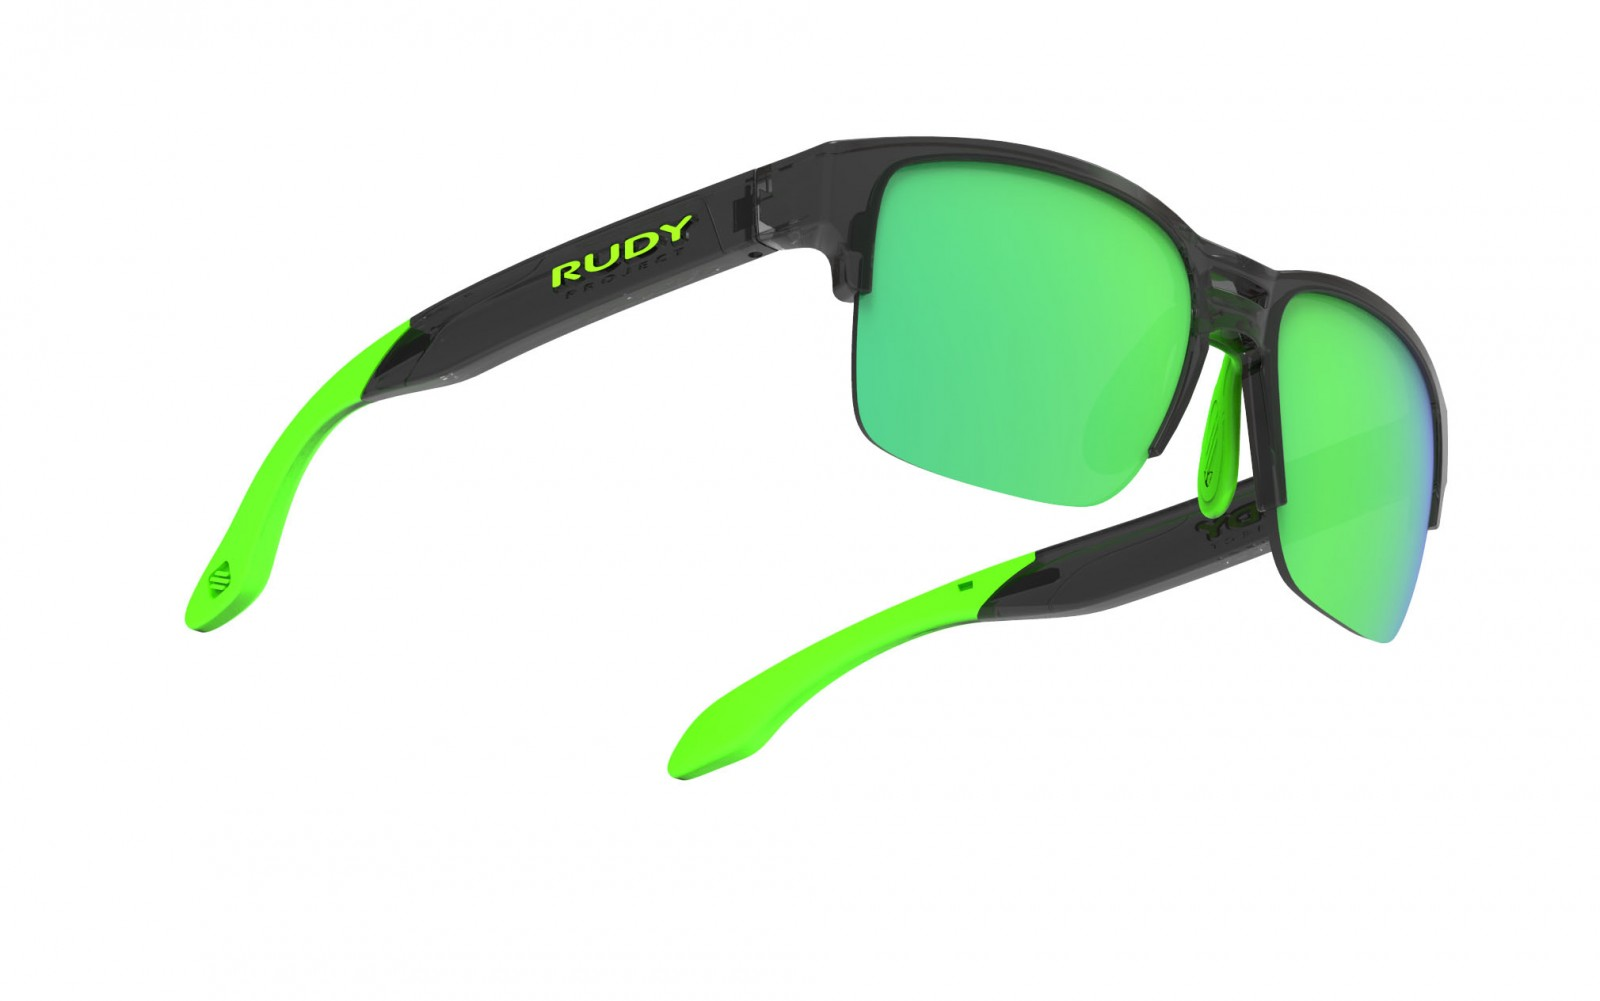 SPINAIR 58 Crystal Graphite / Polar 3FX HDR Multilaser Green